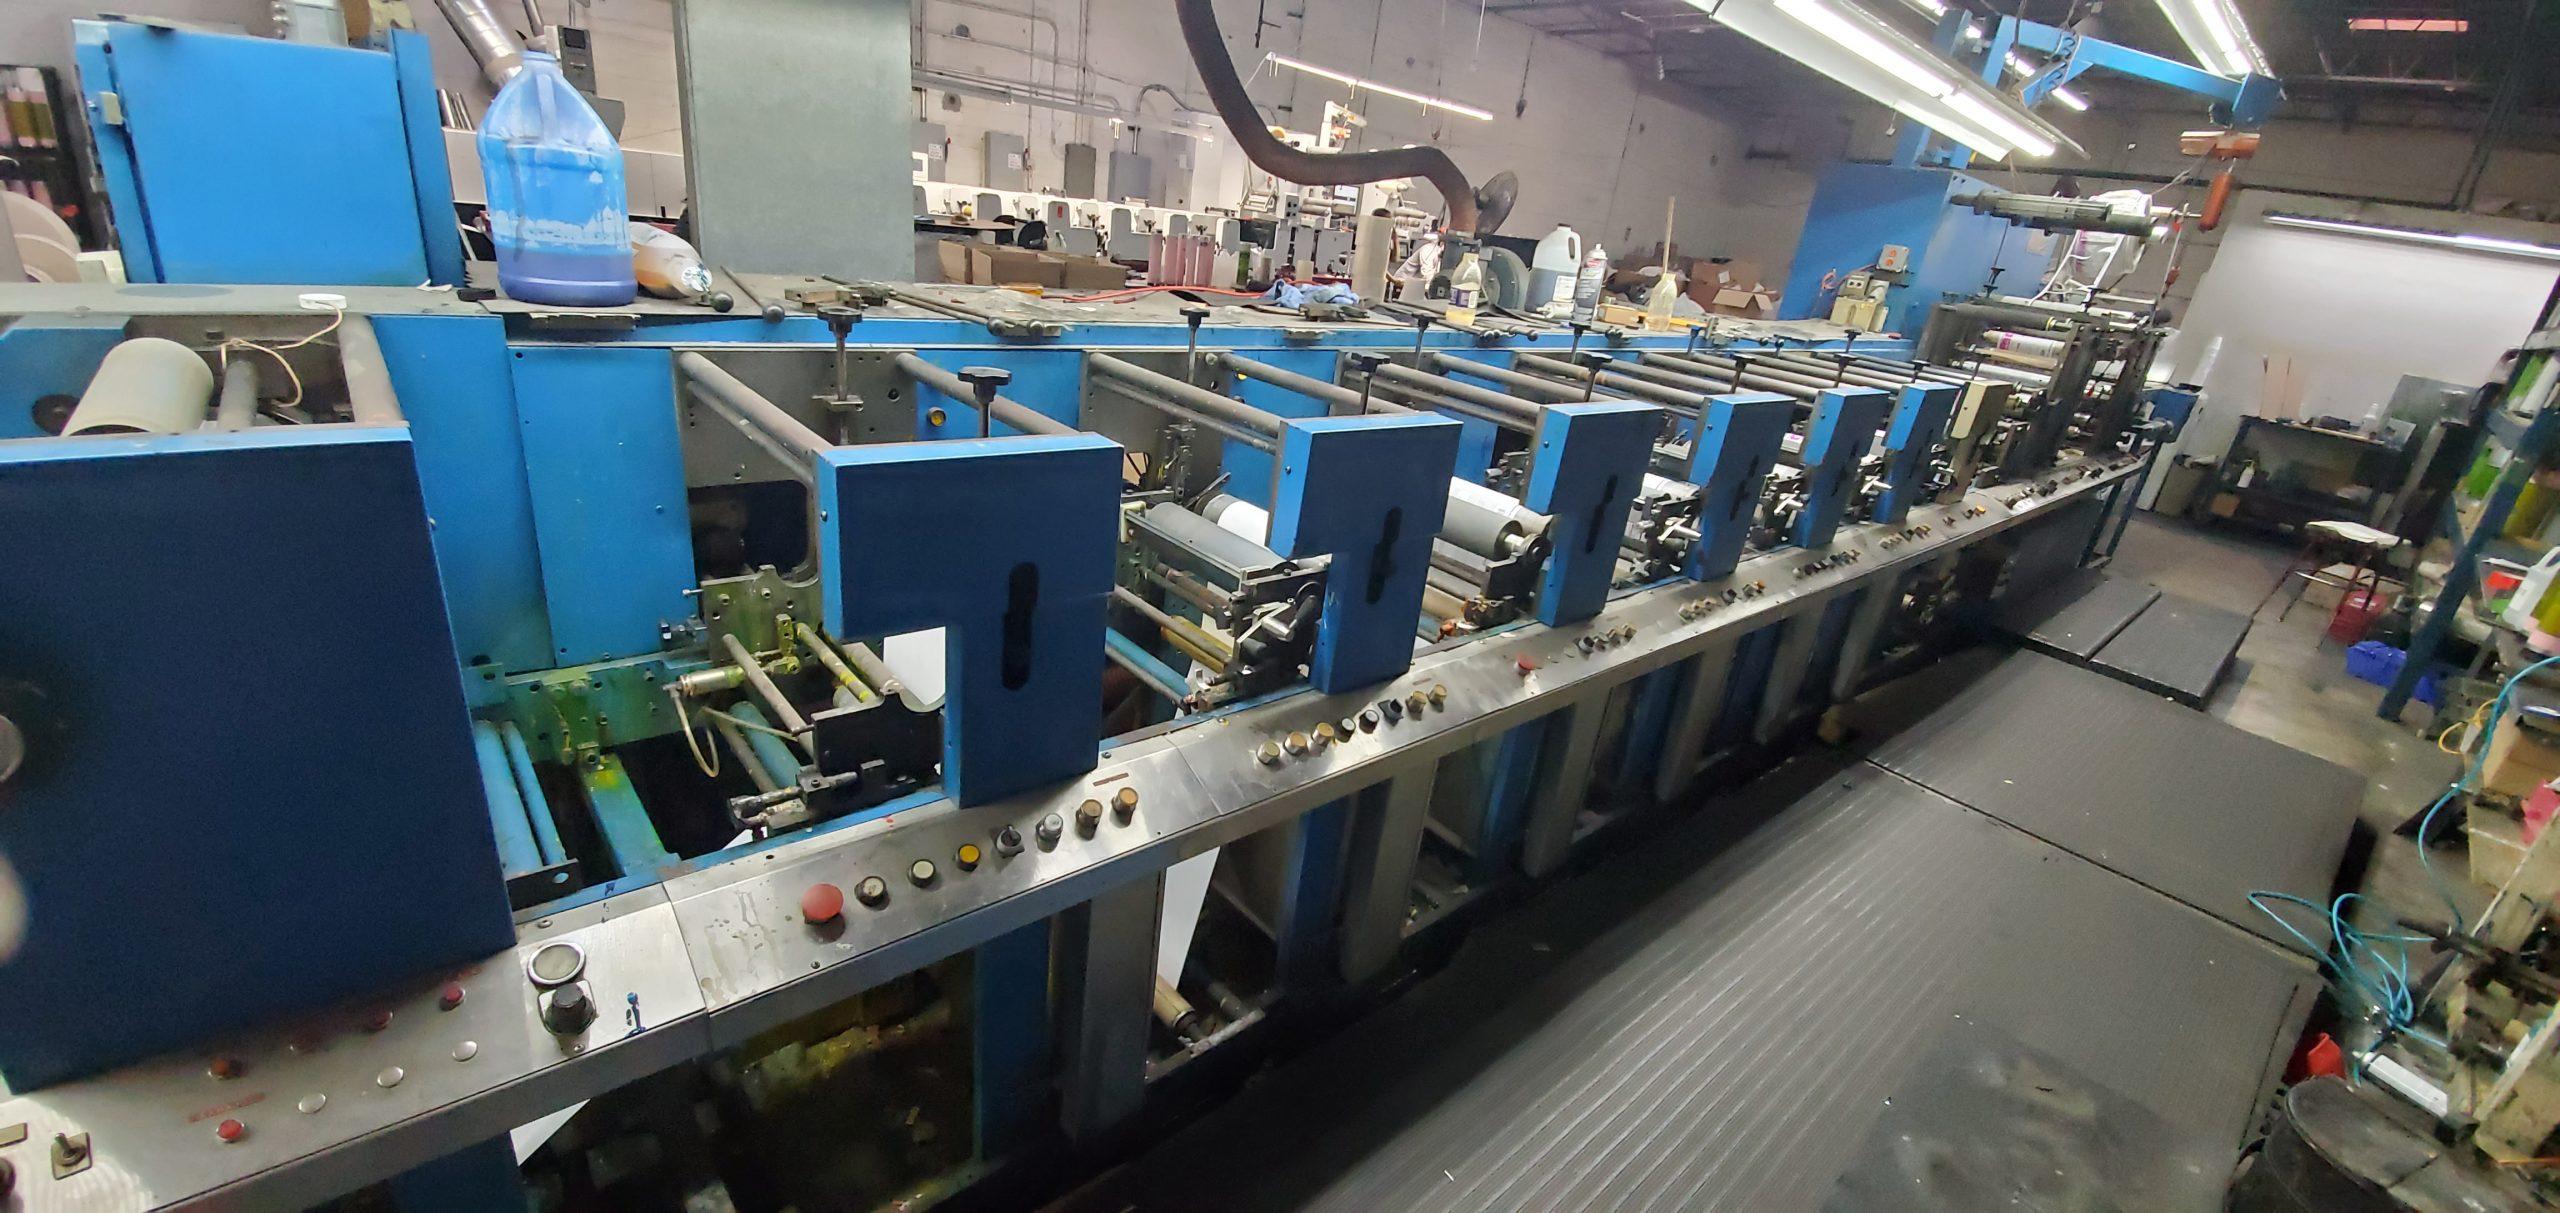 Aquaflex LWSP-1307 - Used Flexo Printing Presses and Used Flexographic Equipment-0